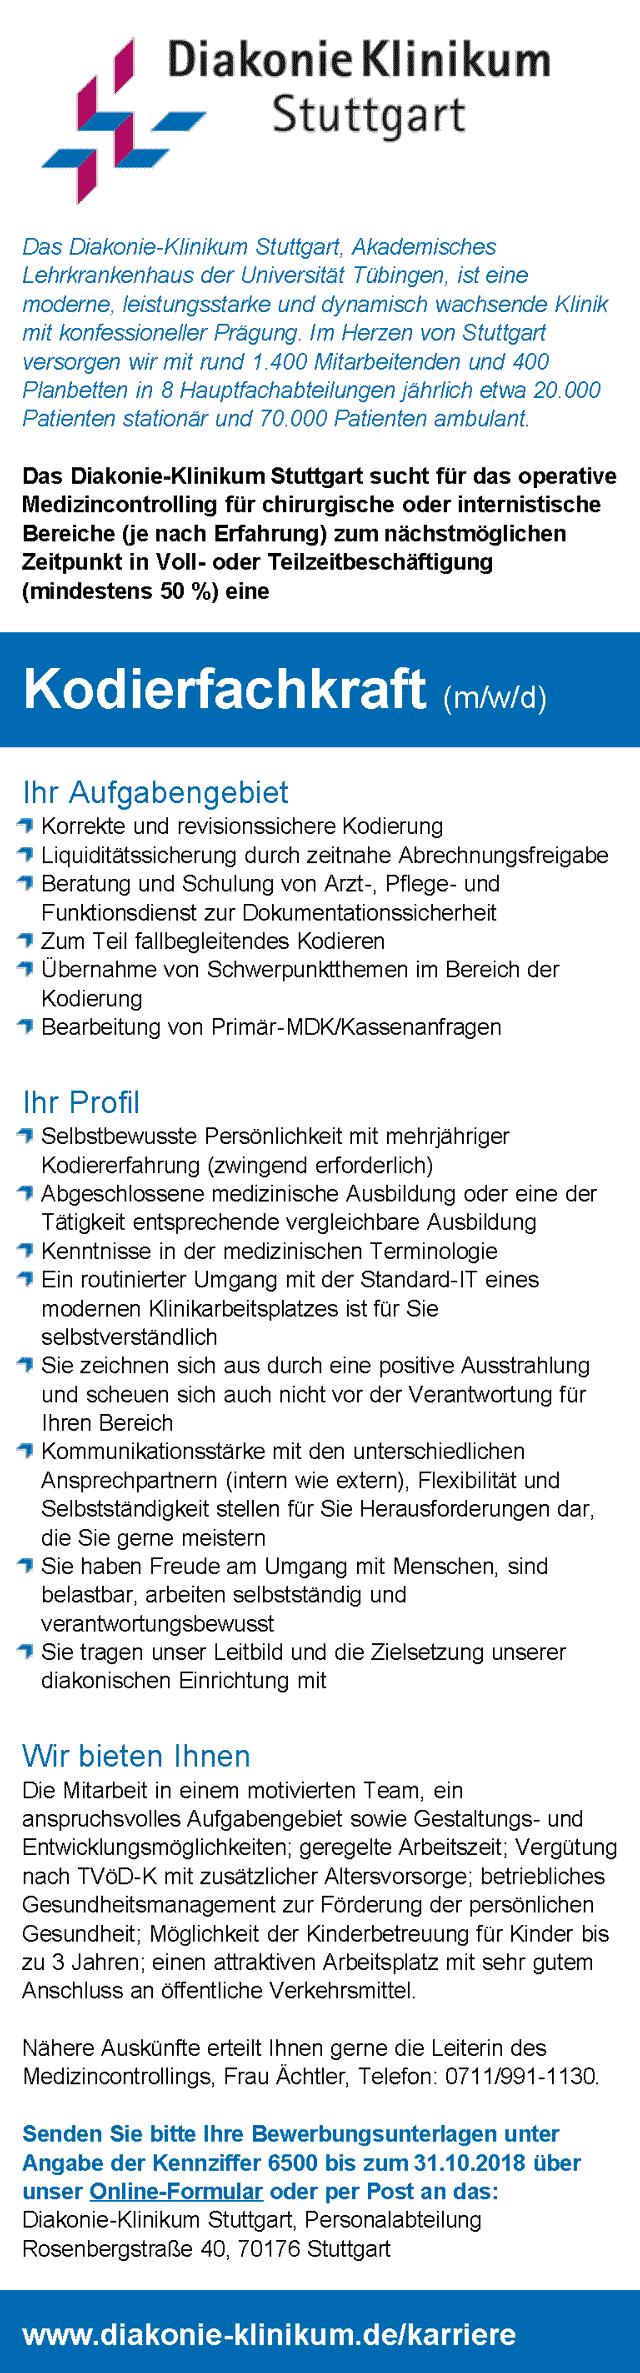 Diakonie-Klinikum Stuttgart: Kodierfachkraft (m/w/d)